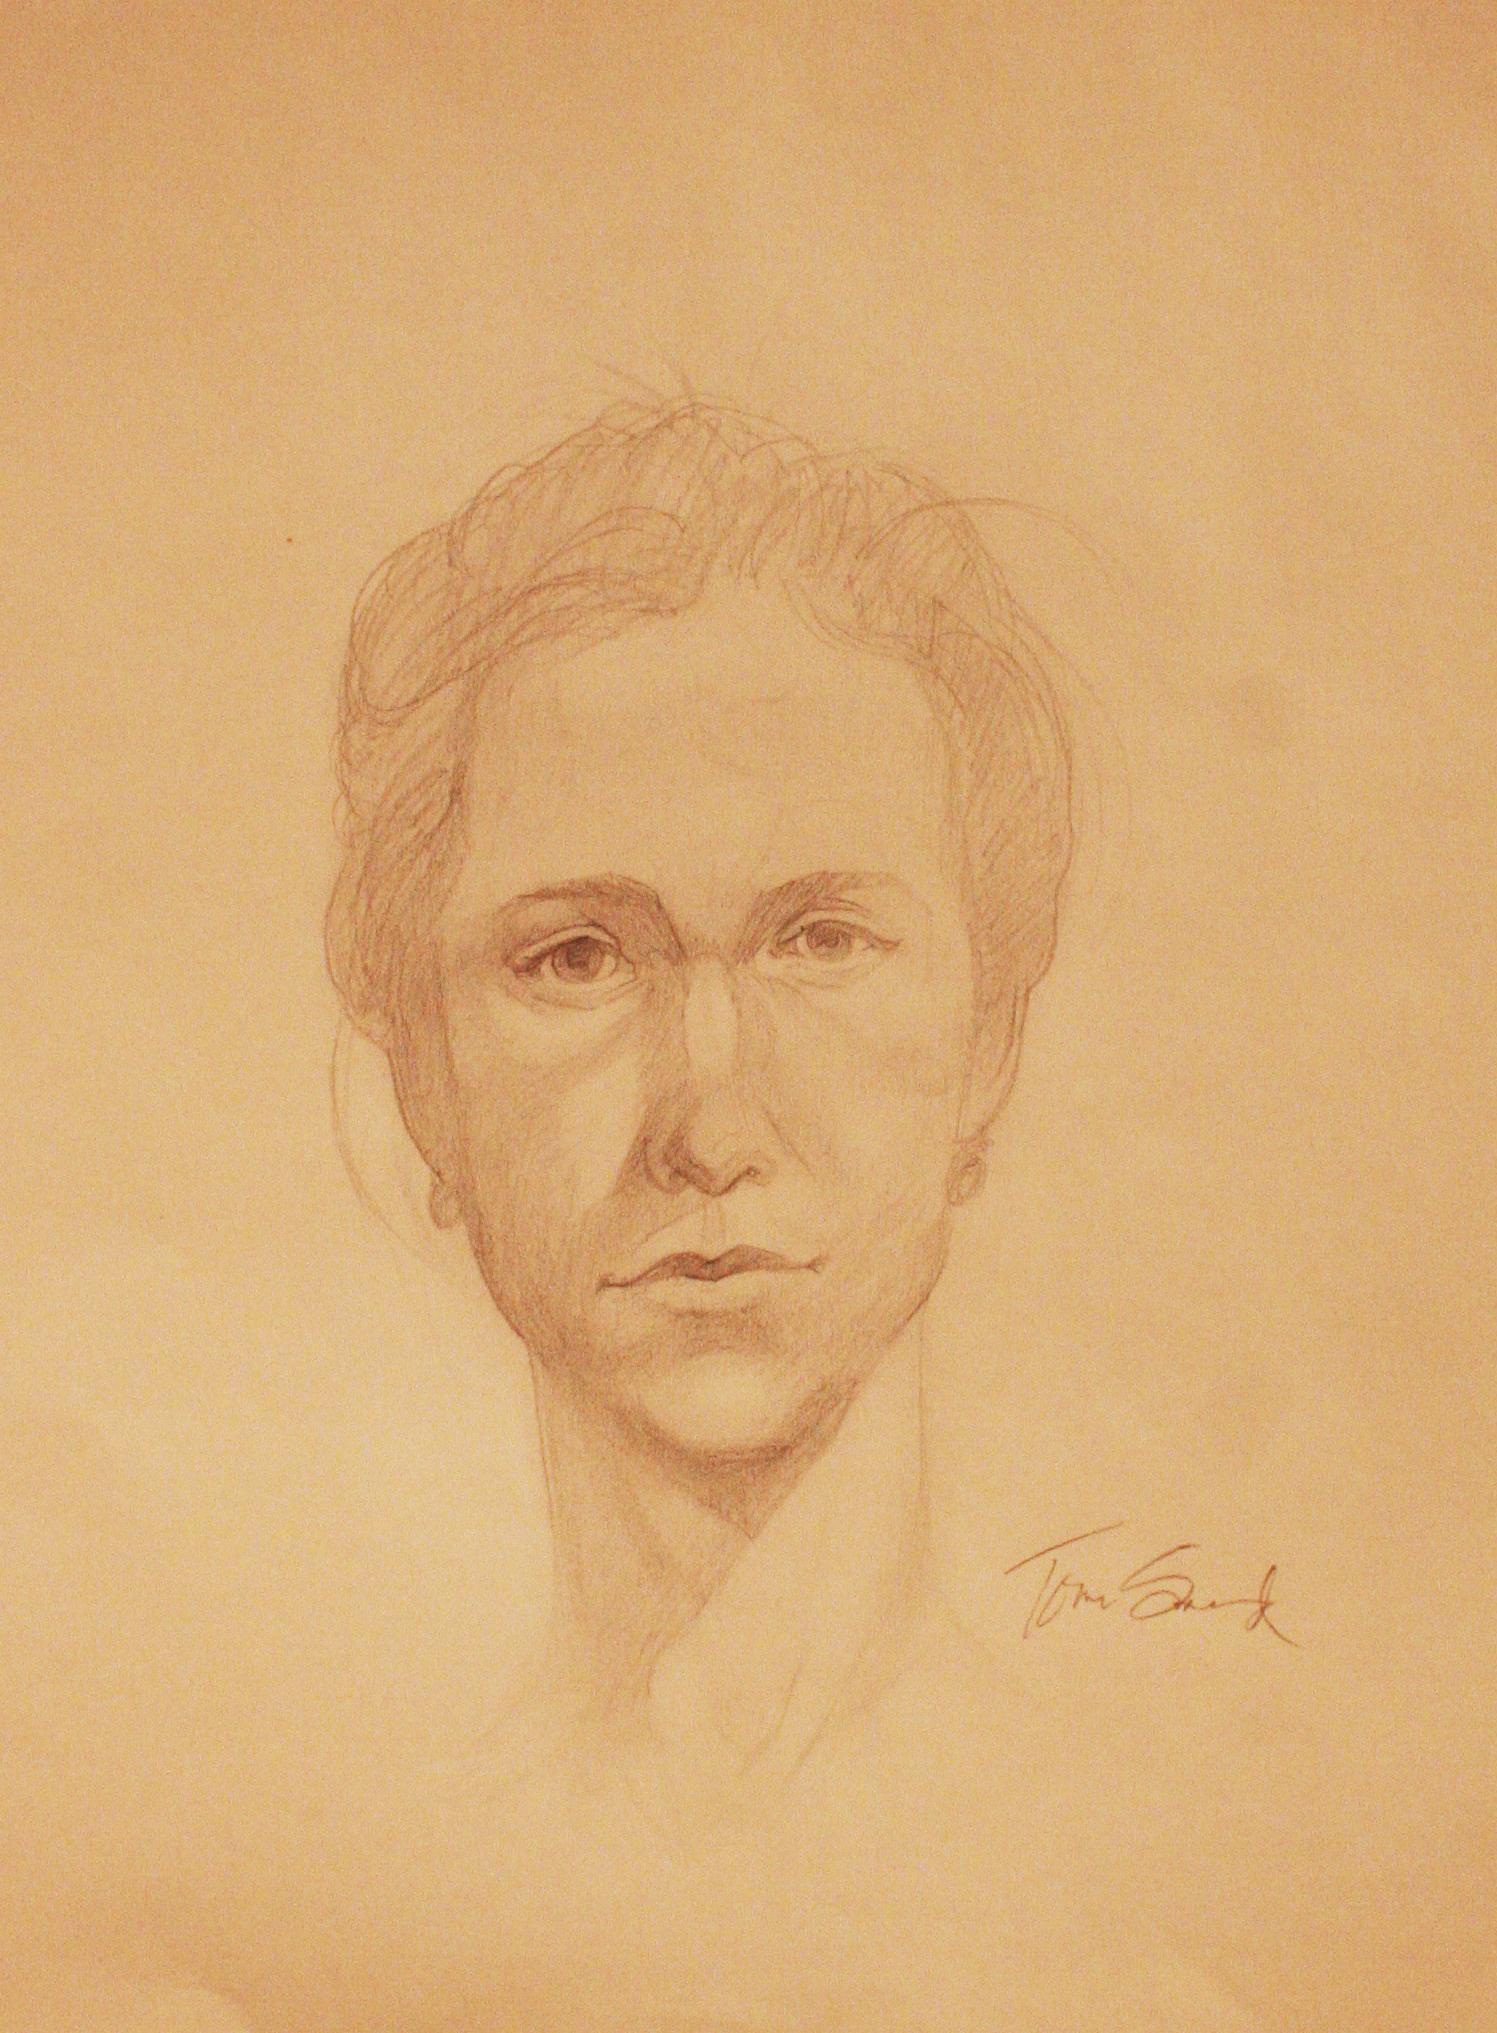 Tom Seward did this hour portrait.